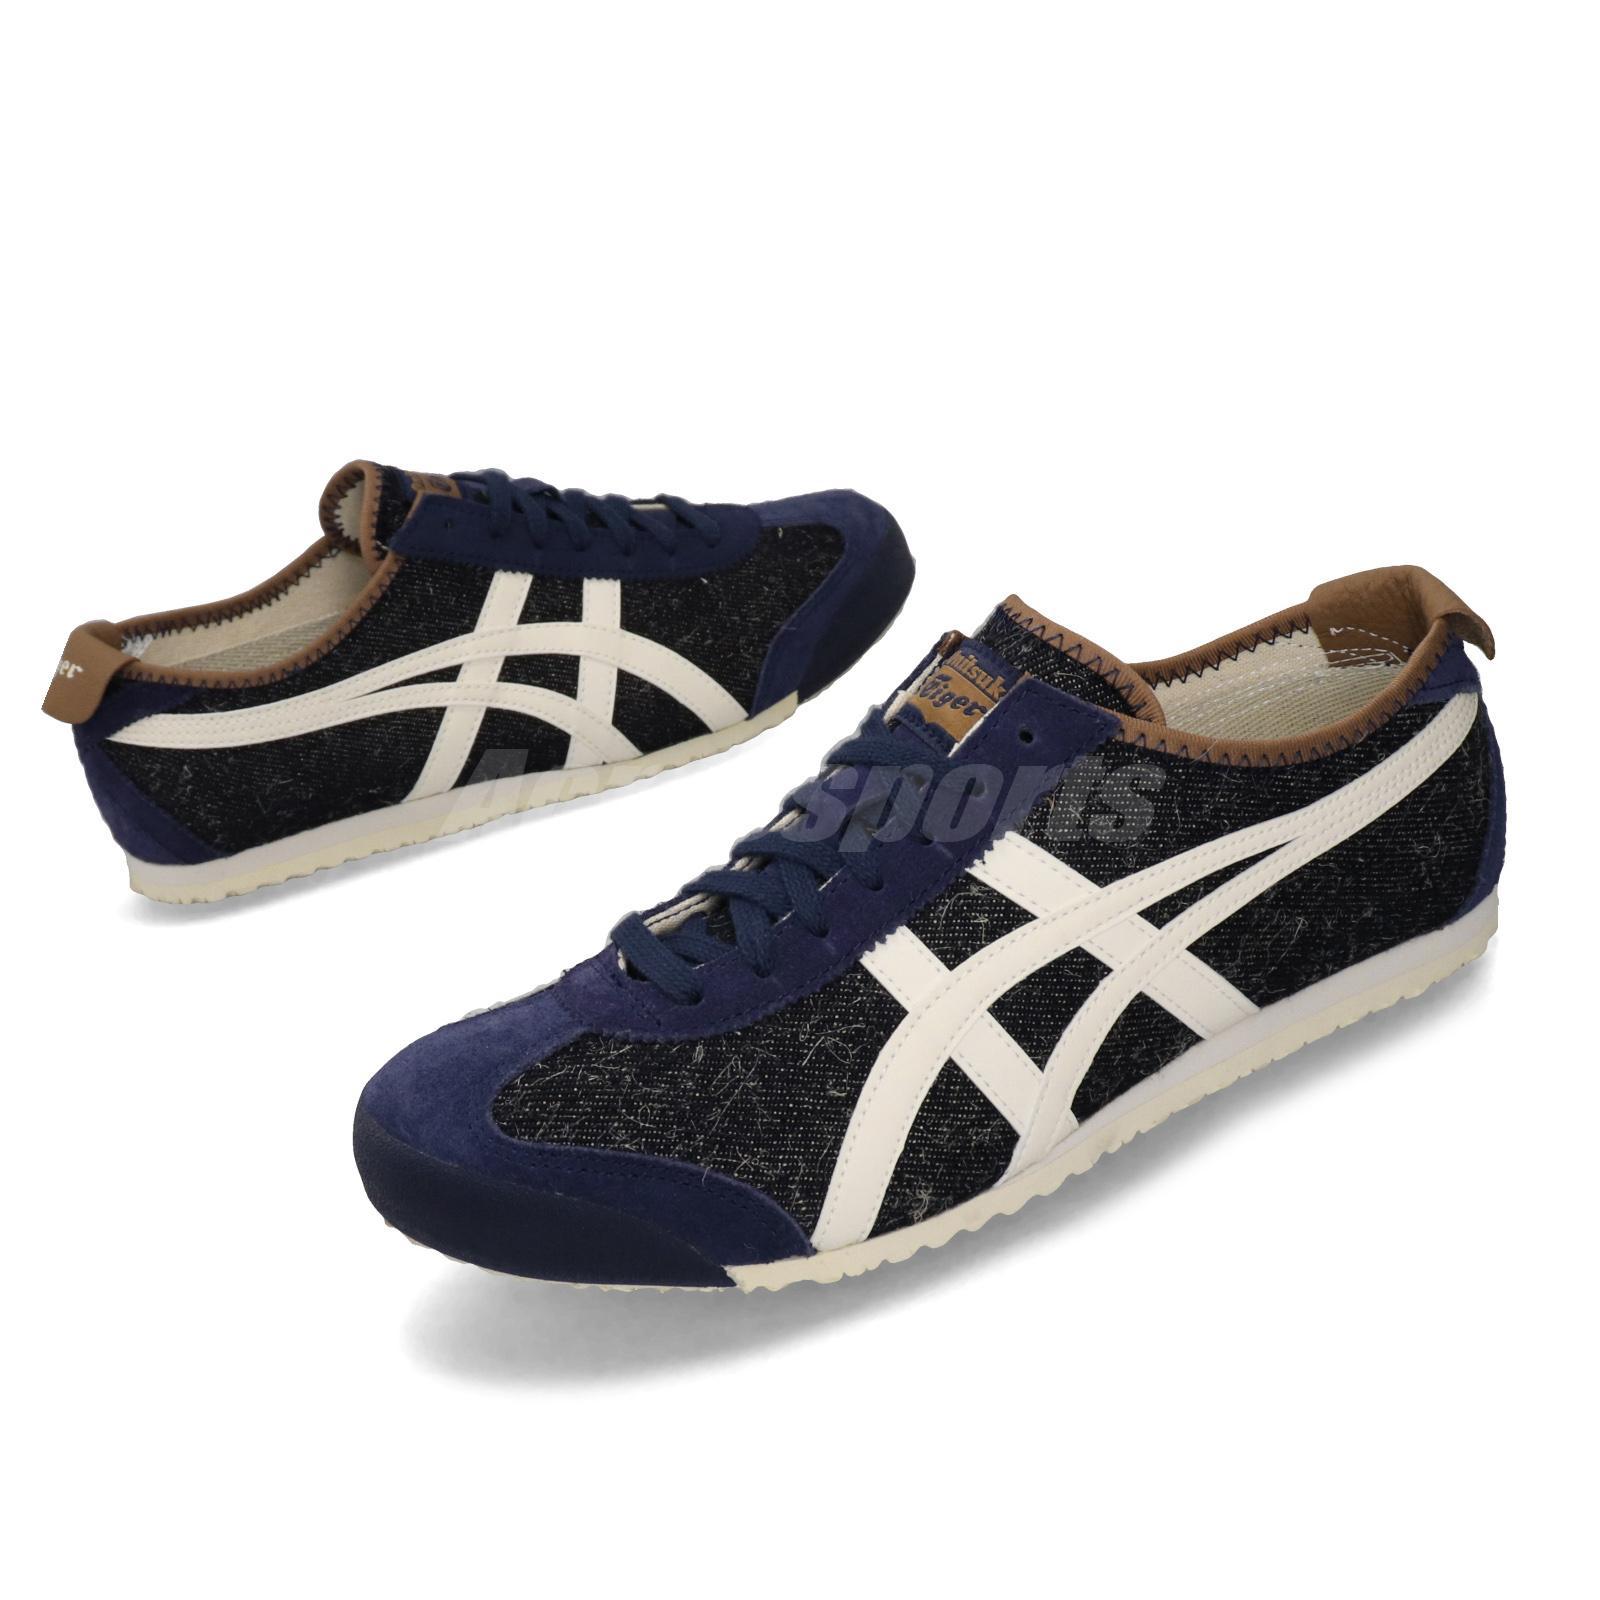 onitsuka tiger mexico 66 shoes size chart european mens track